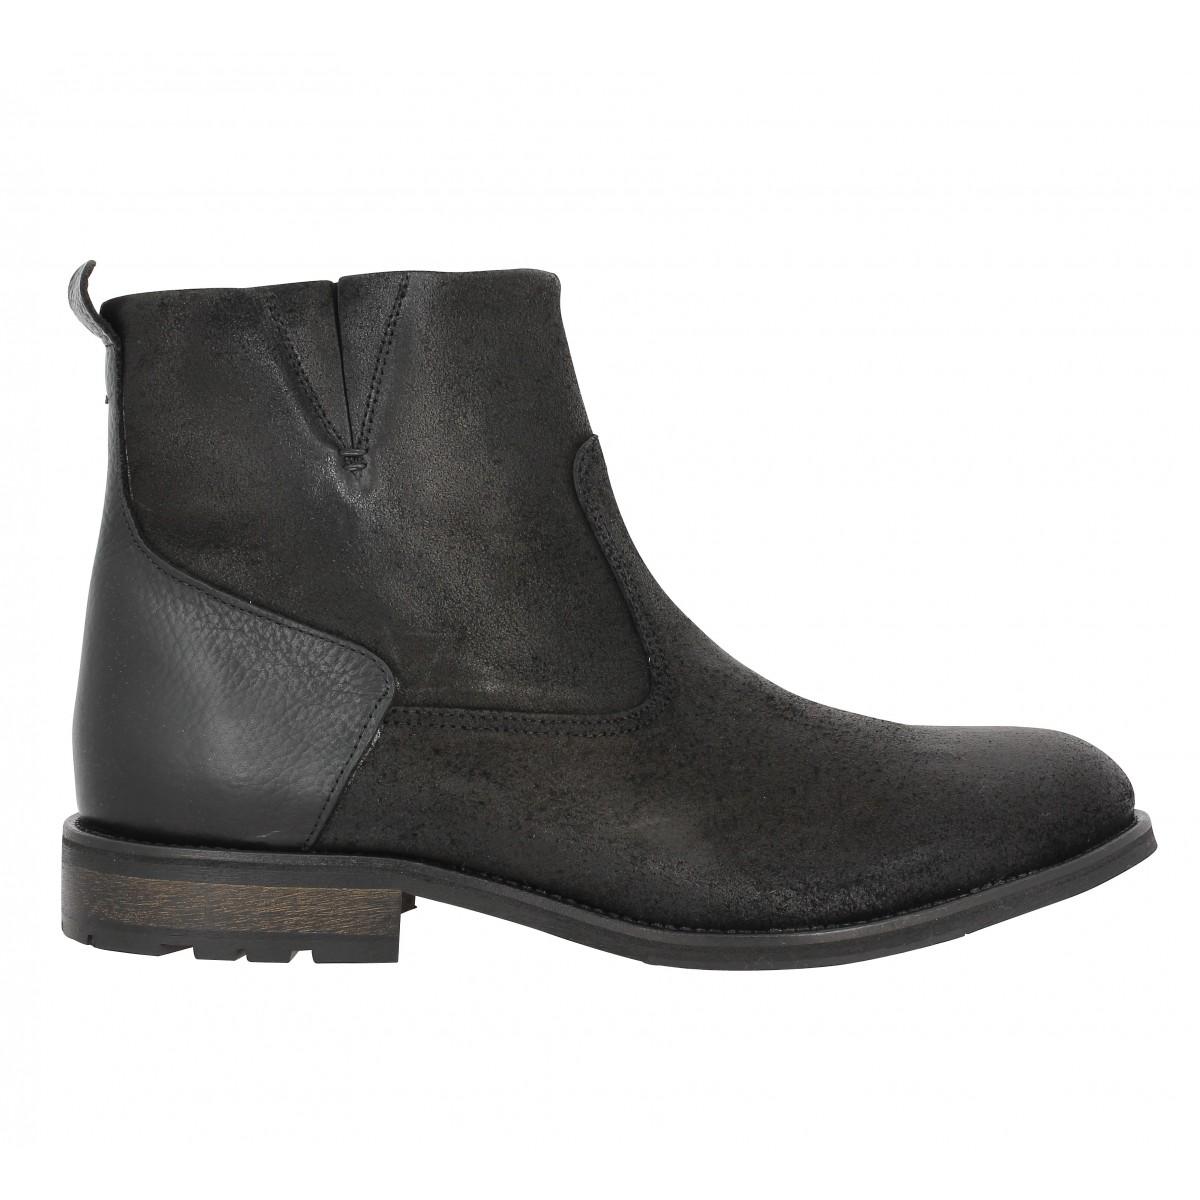 soldes schmoove steam boots noir homme fanny chaussures. Black Bedroom Furniture Sets. Home Design Ideas